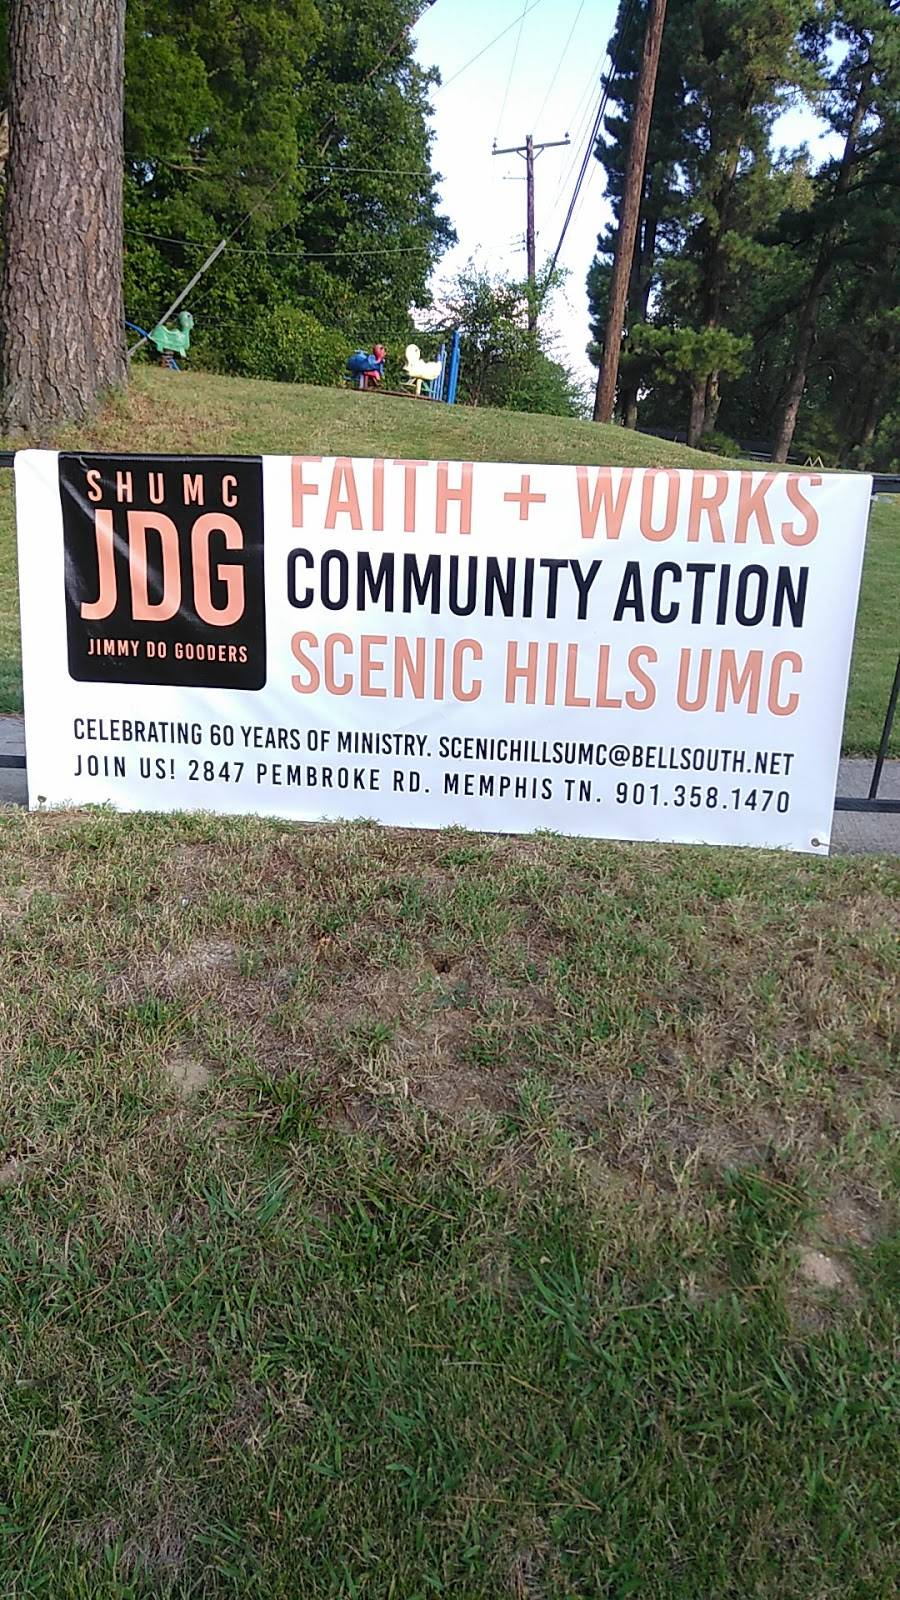 Scenic Hills United Methodist - church  | Photo 3 of 3 | Address: 2847 Pembroke Rd, Memphis, TN 38128, USA | Phone: (901) 358-1470